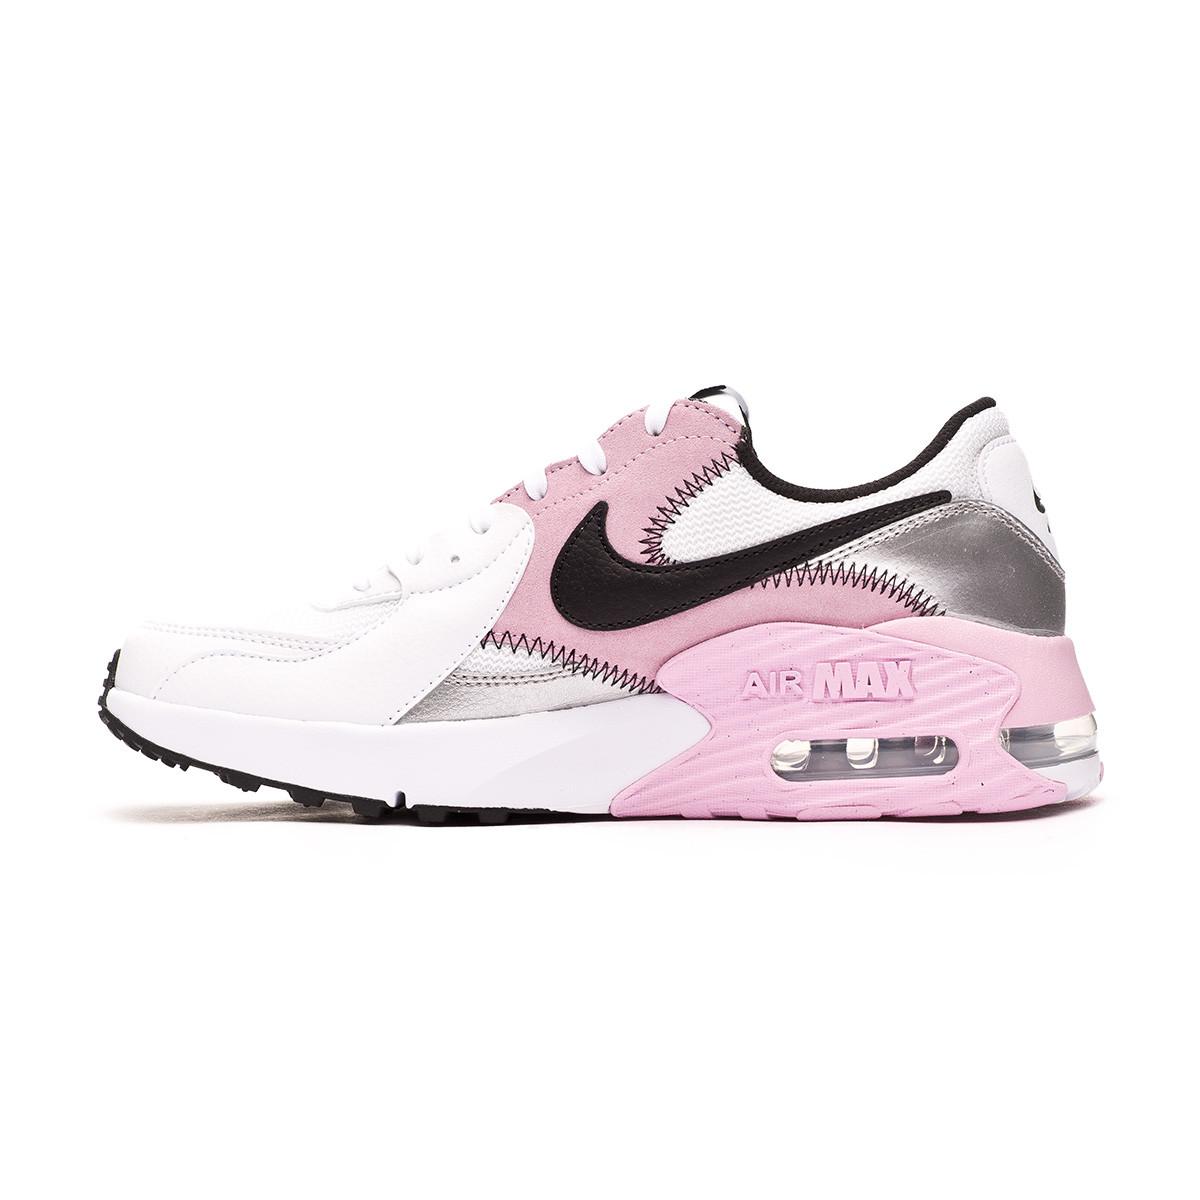 espacio Ambicioso interferencia  Trainers Nike Air Max Excee Mujer White-Black-Lite artic pink-Metallic  silver - Football store Fútbol Emotion